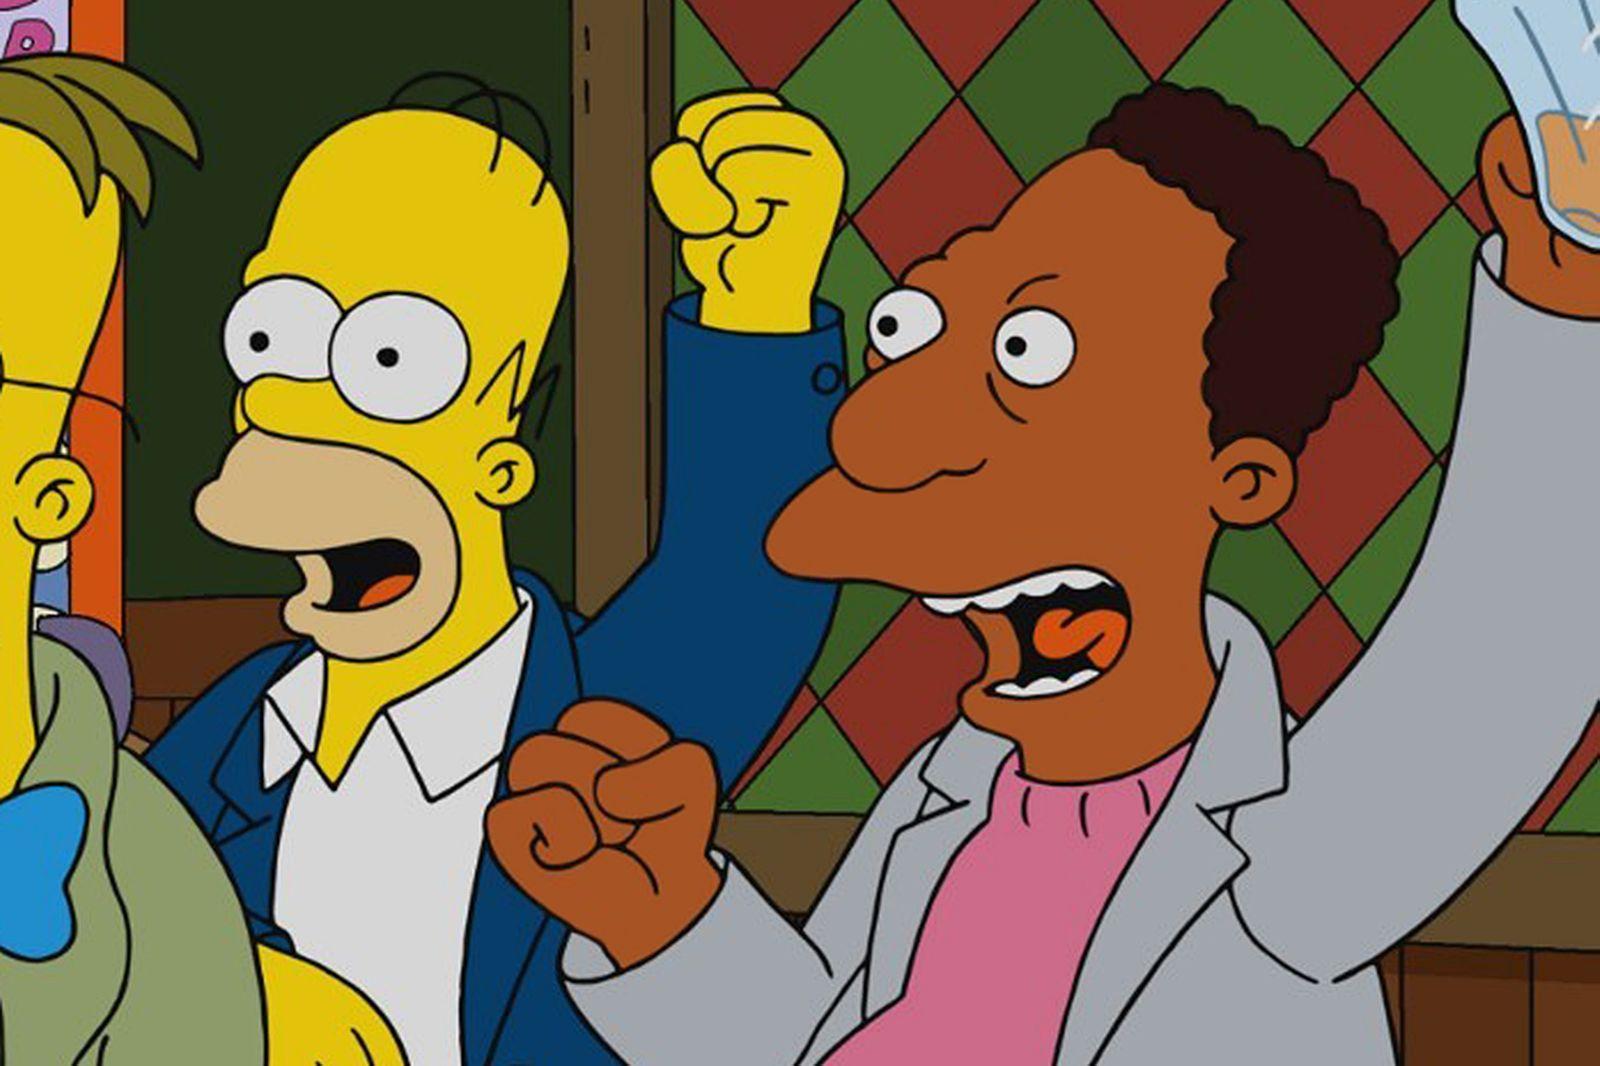 THE SIMPSONS, wearing suspenders: Lenny Leonard (voice: Harry Shearer)...